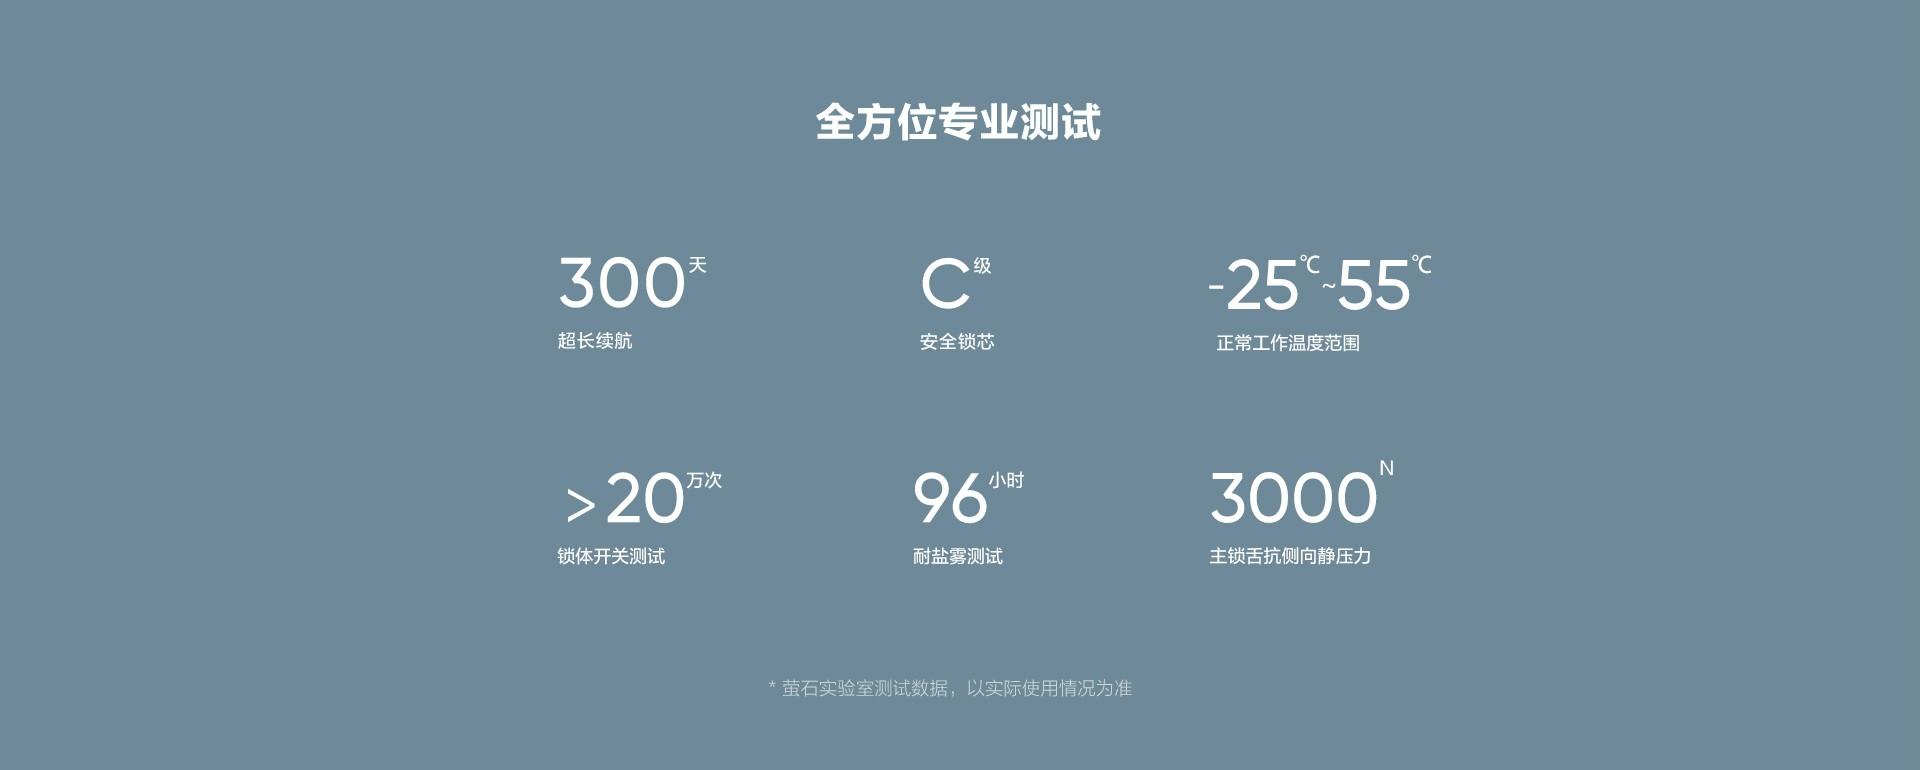 30VS-web_23.jpg